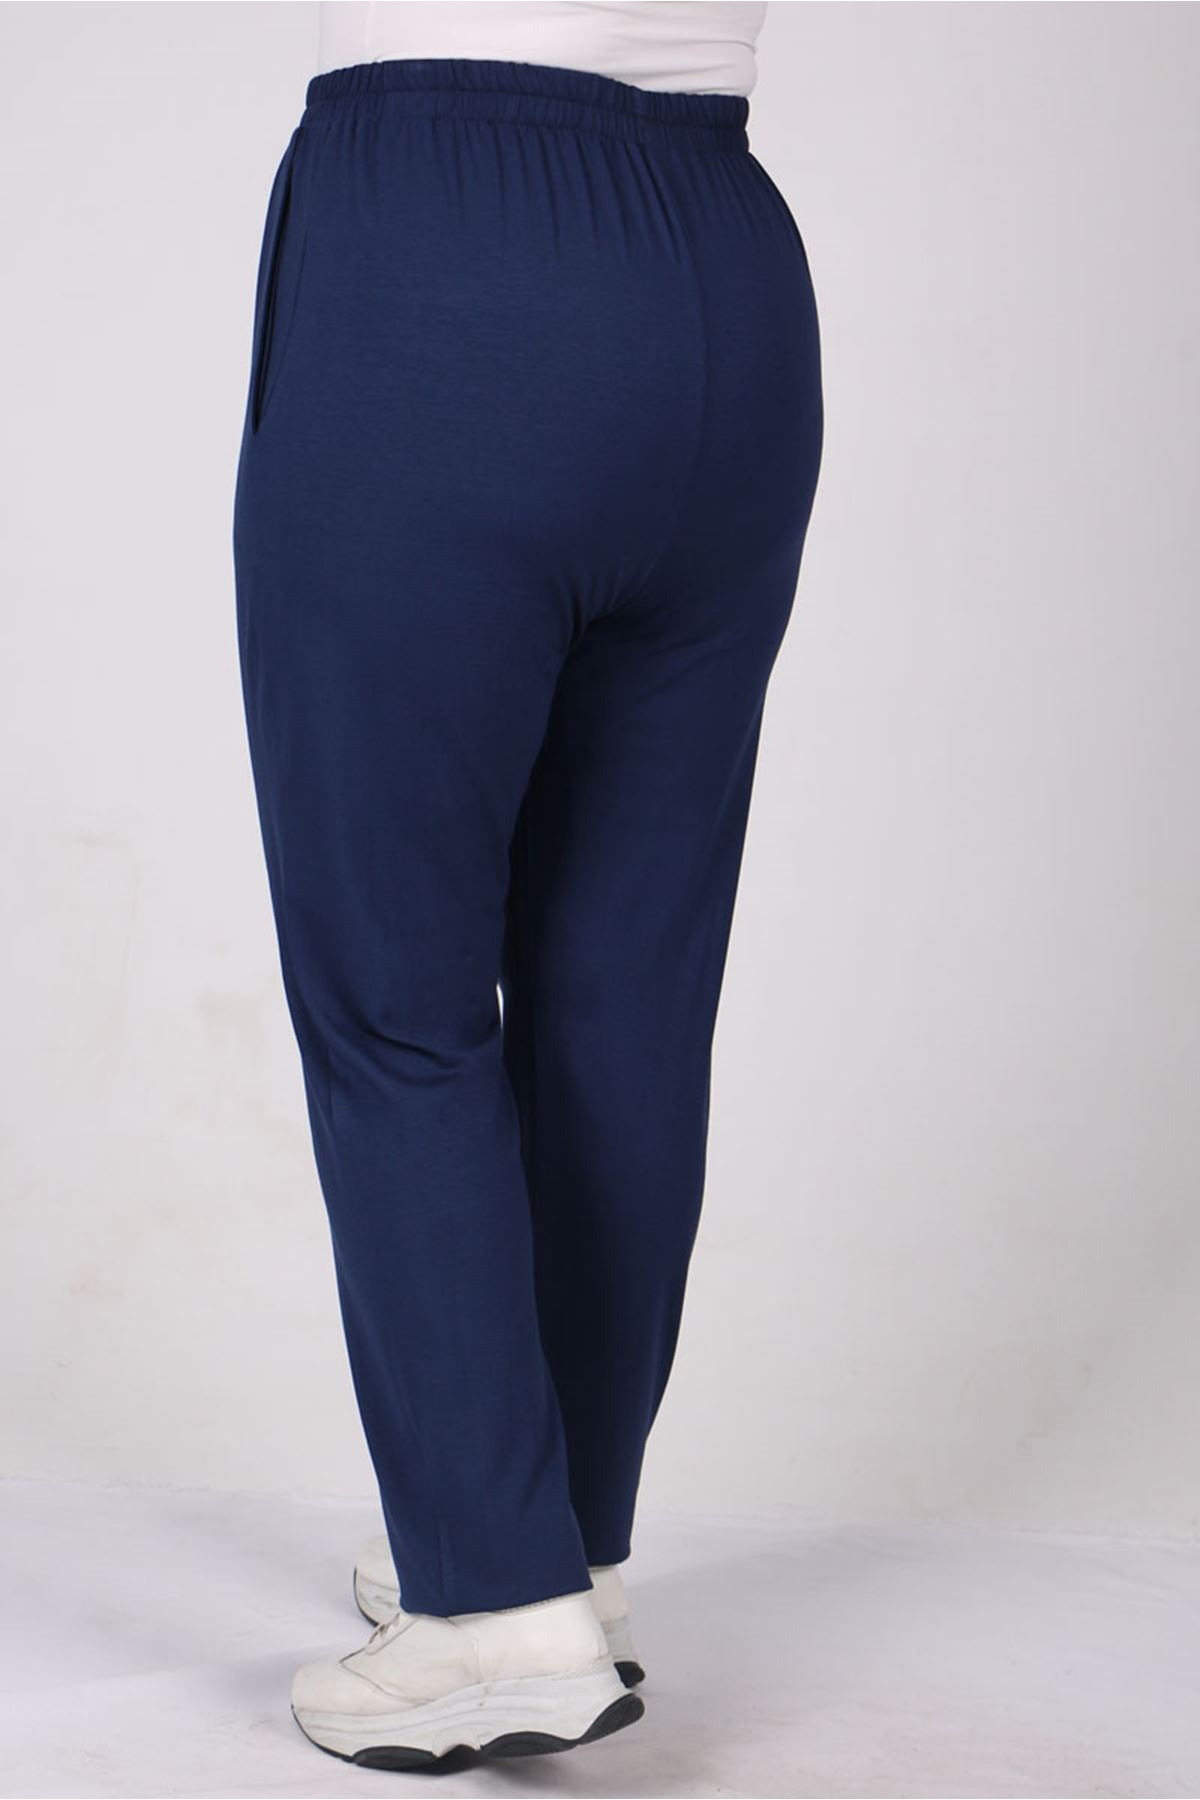 9160 Plus Size High Waist Elastic Pants - Indigo